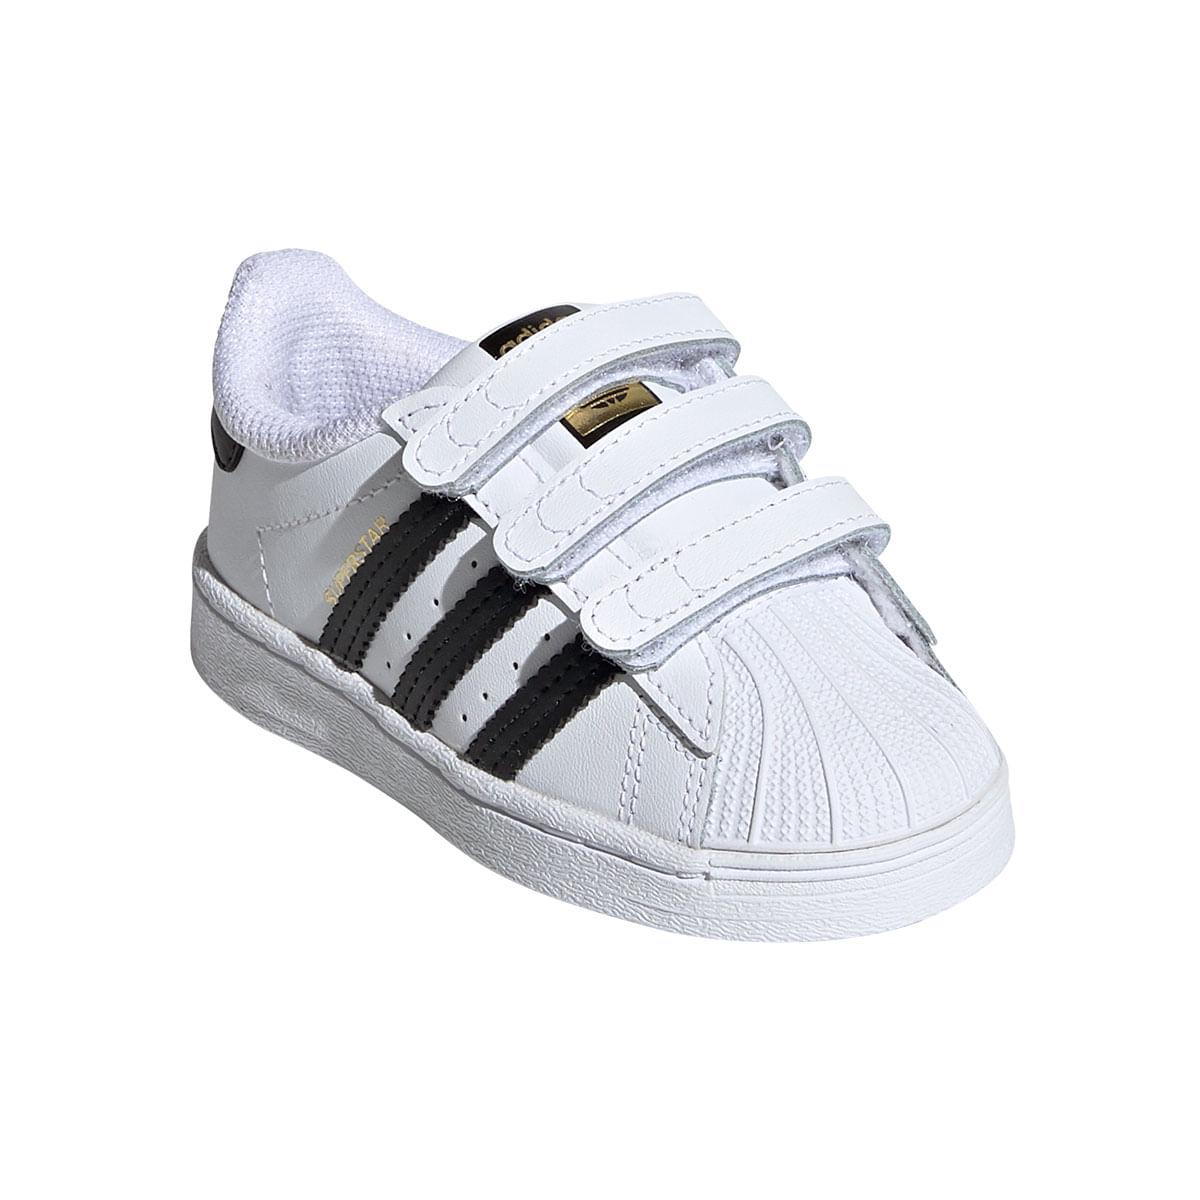 Tenis-Infantil-Adidas-Superstar--18-ao-25-